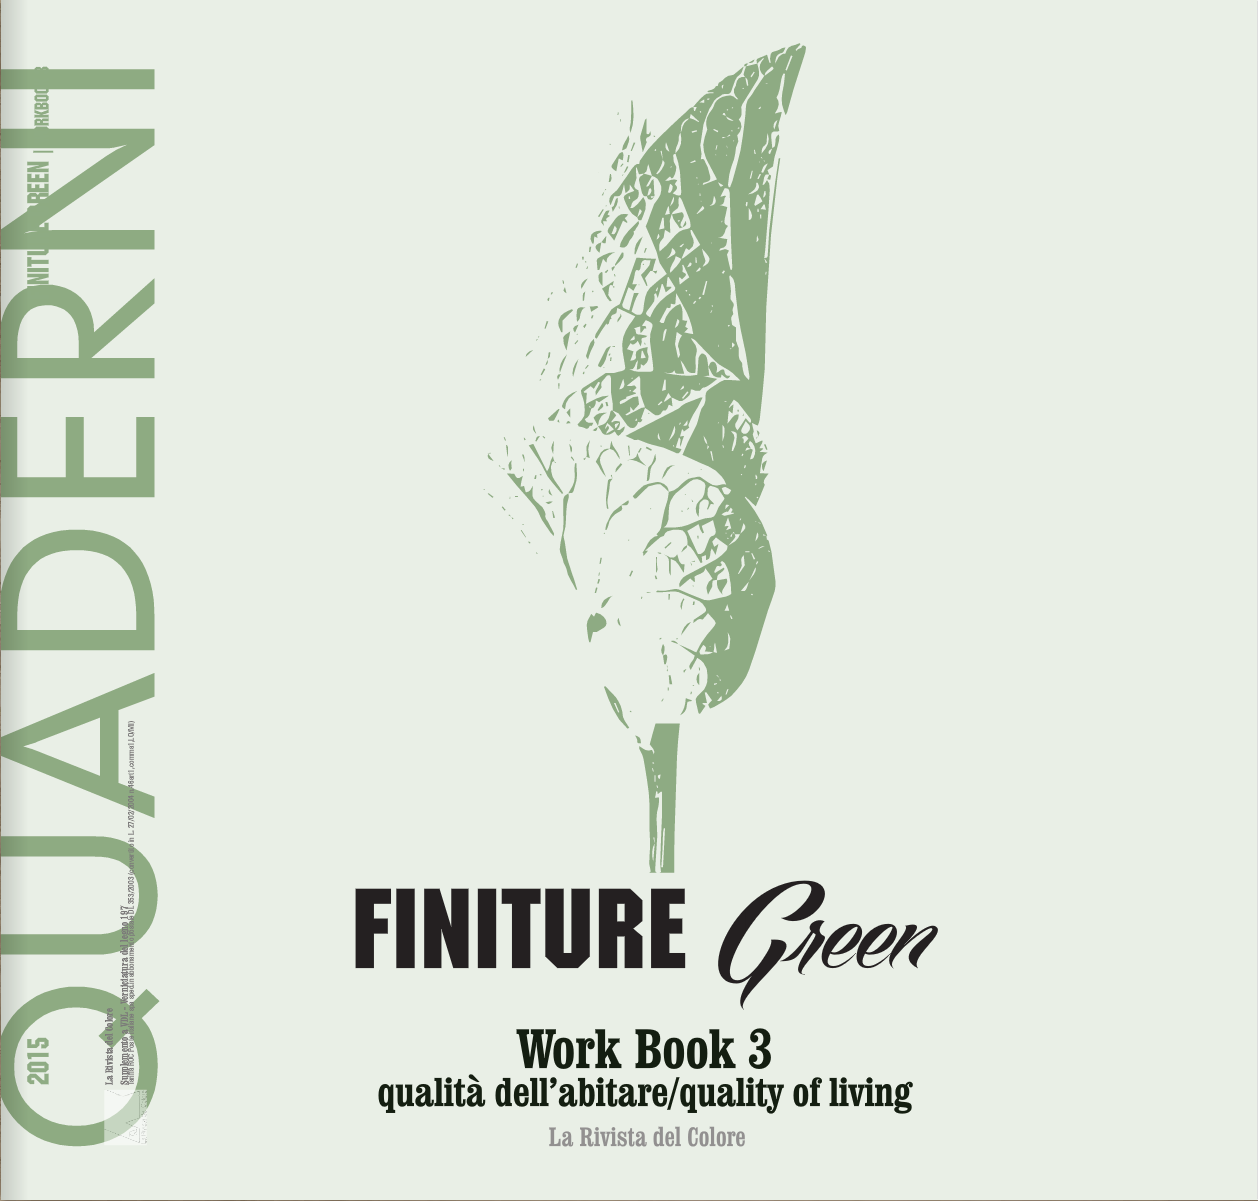 finiture green 3